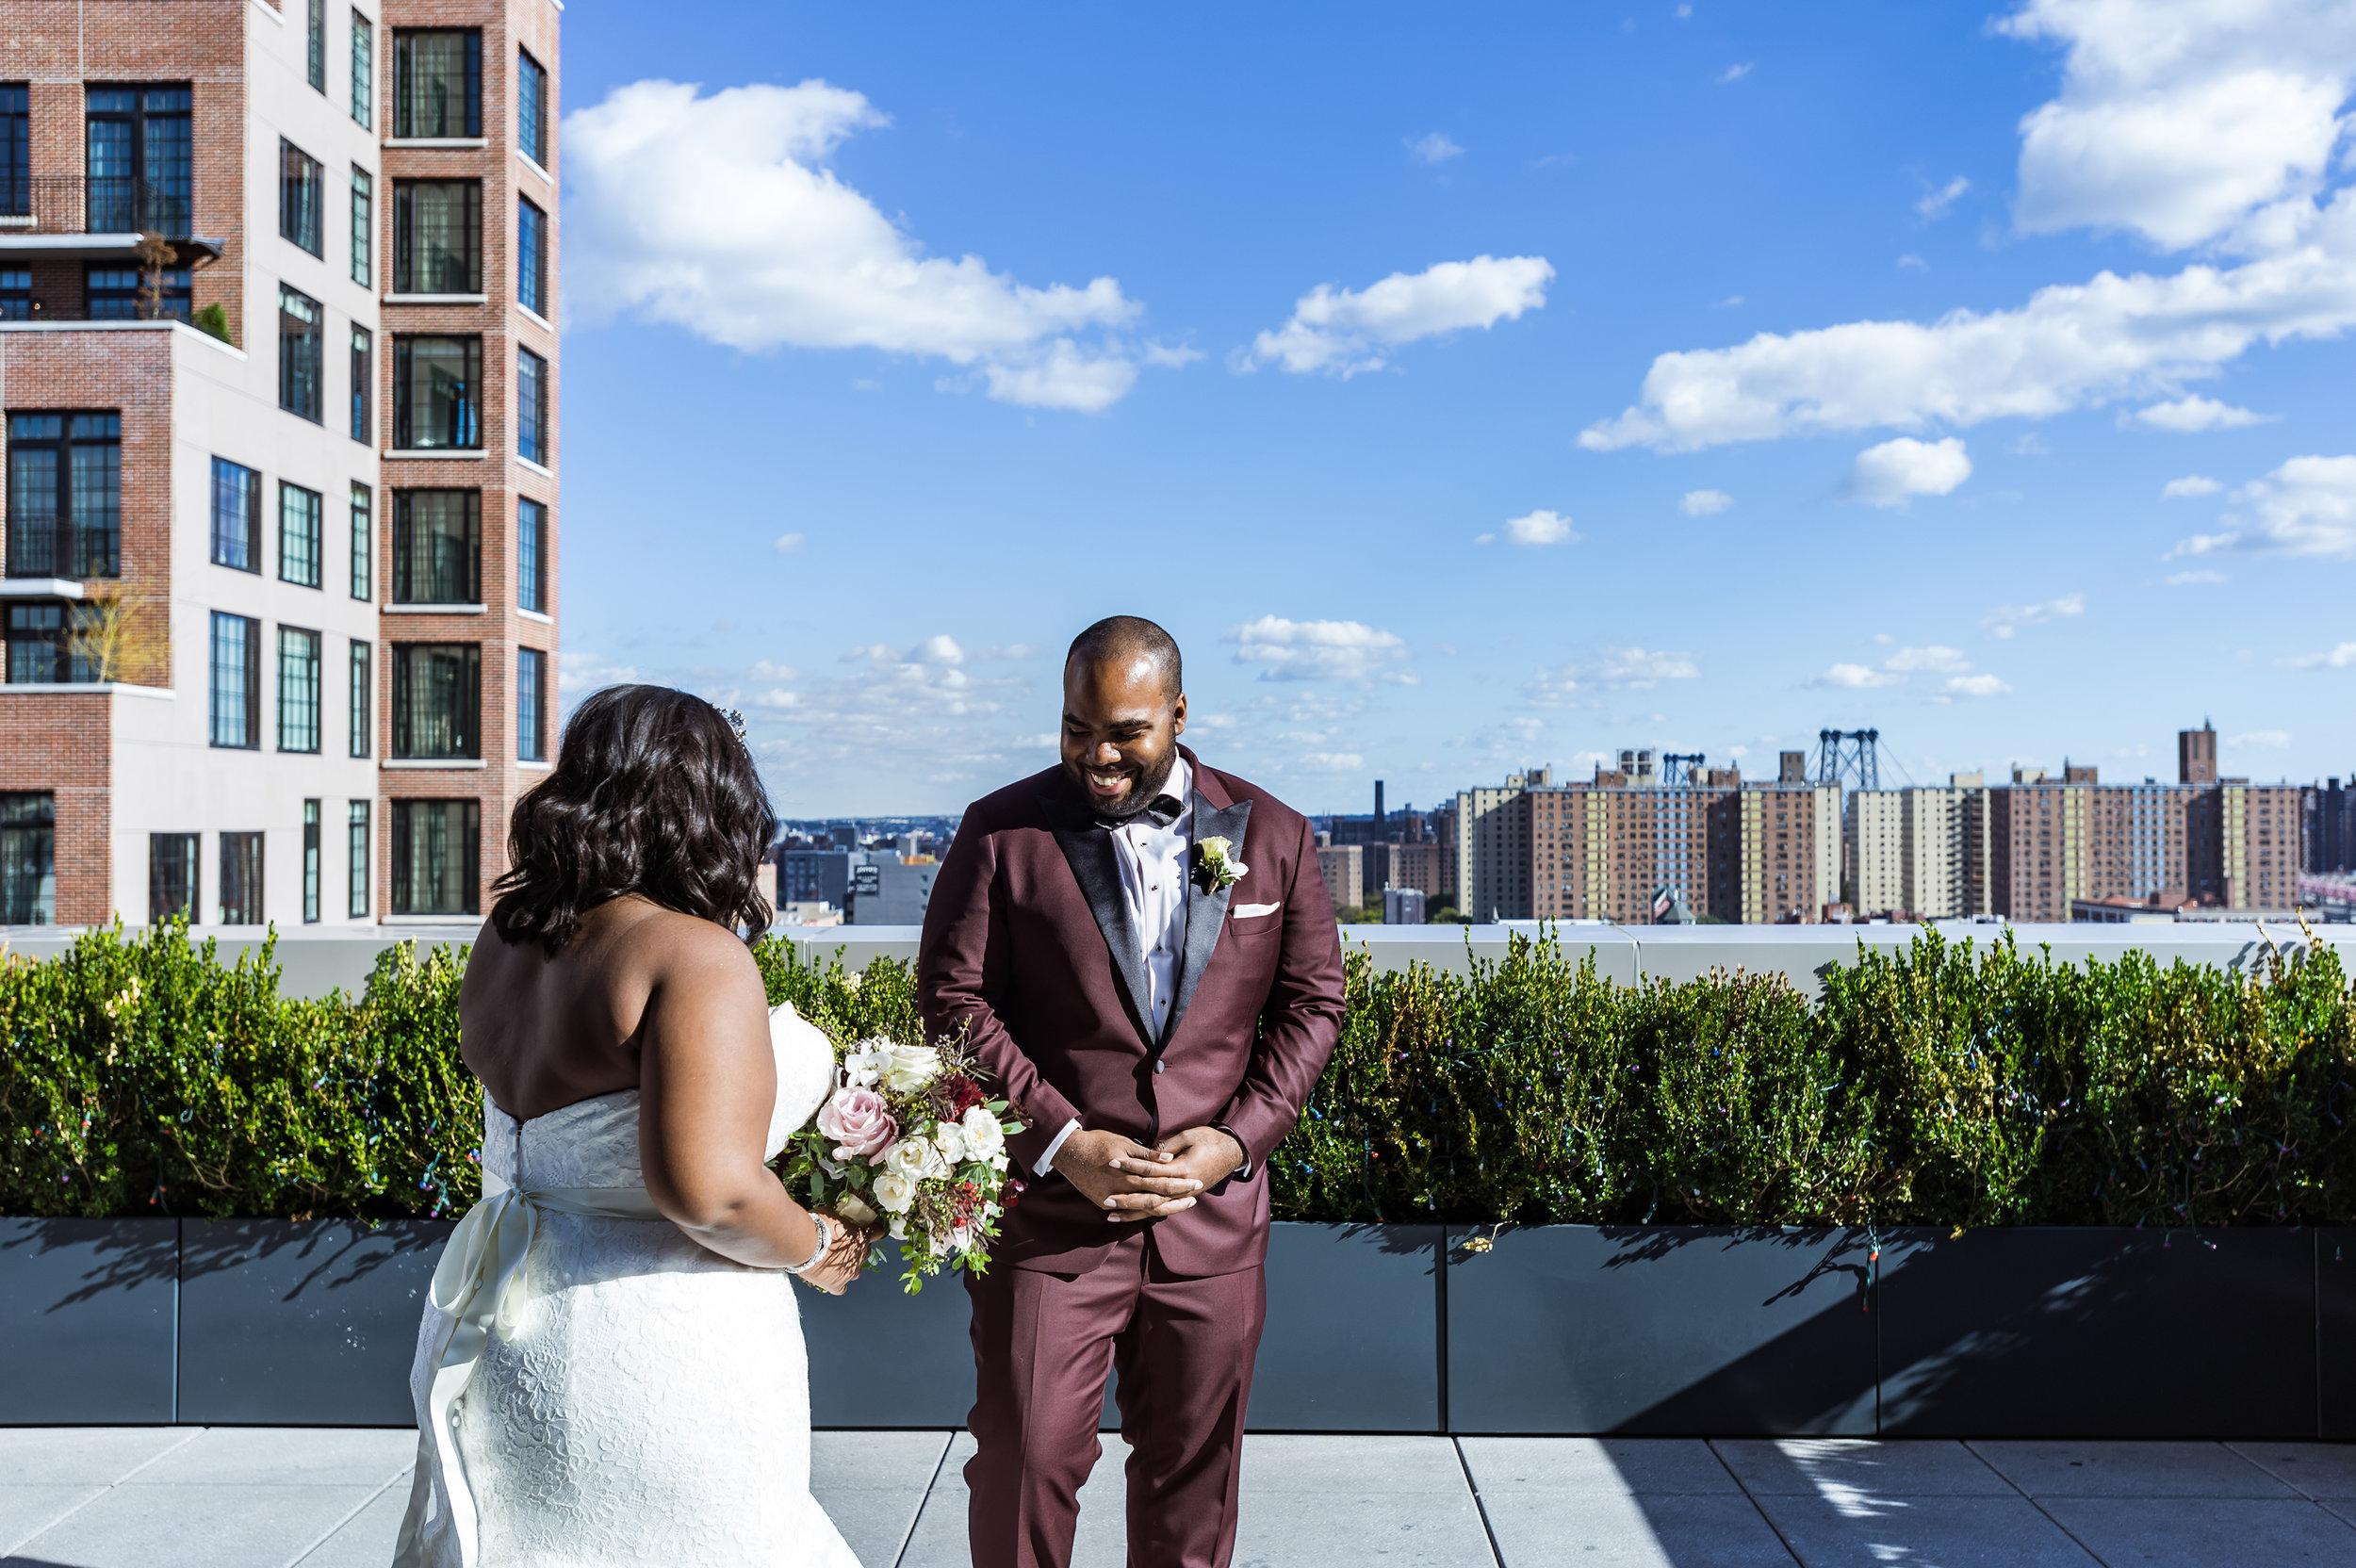 victorious-events-nyc-022-yanique-rondel-greenpoint-loft-wedding-amy-anaiz.jpg